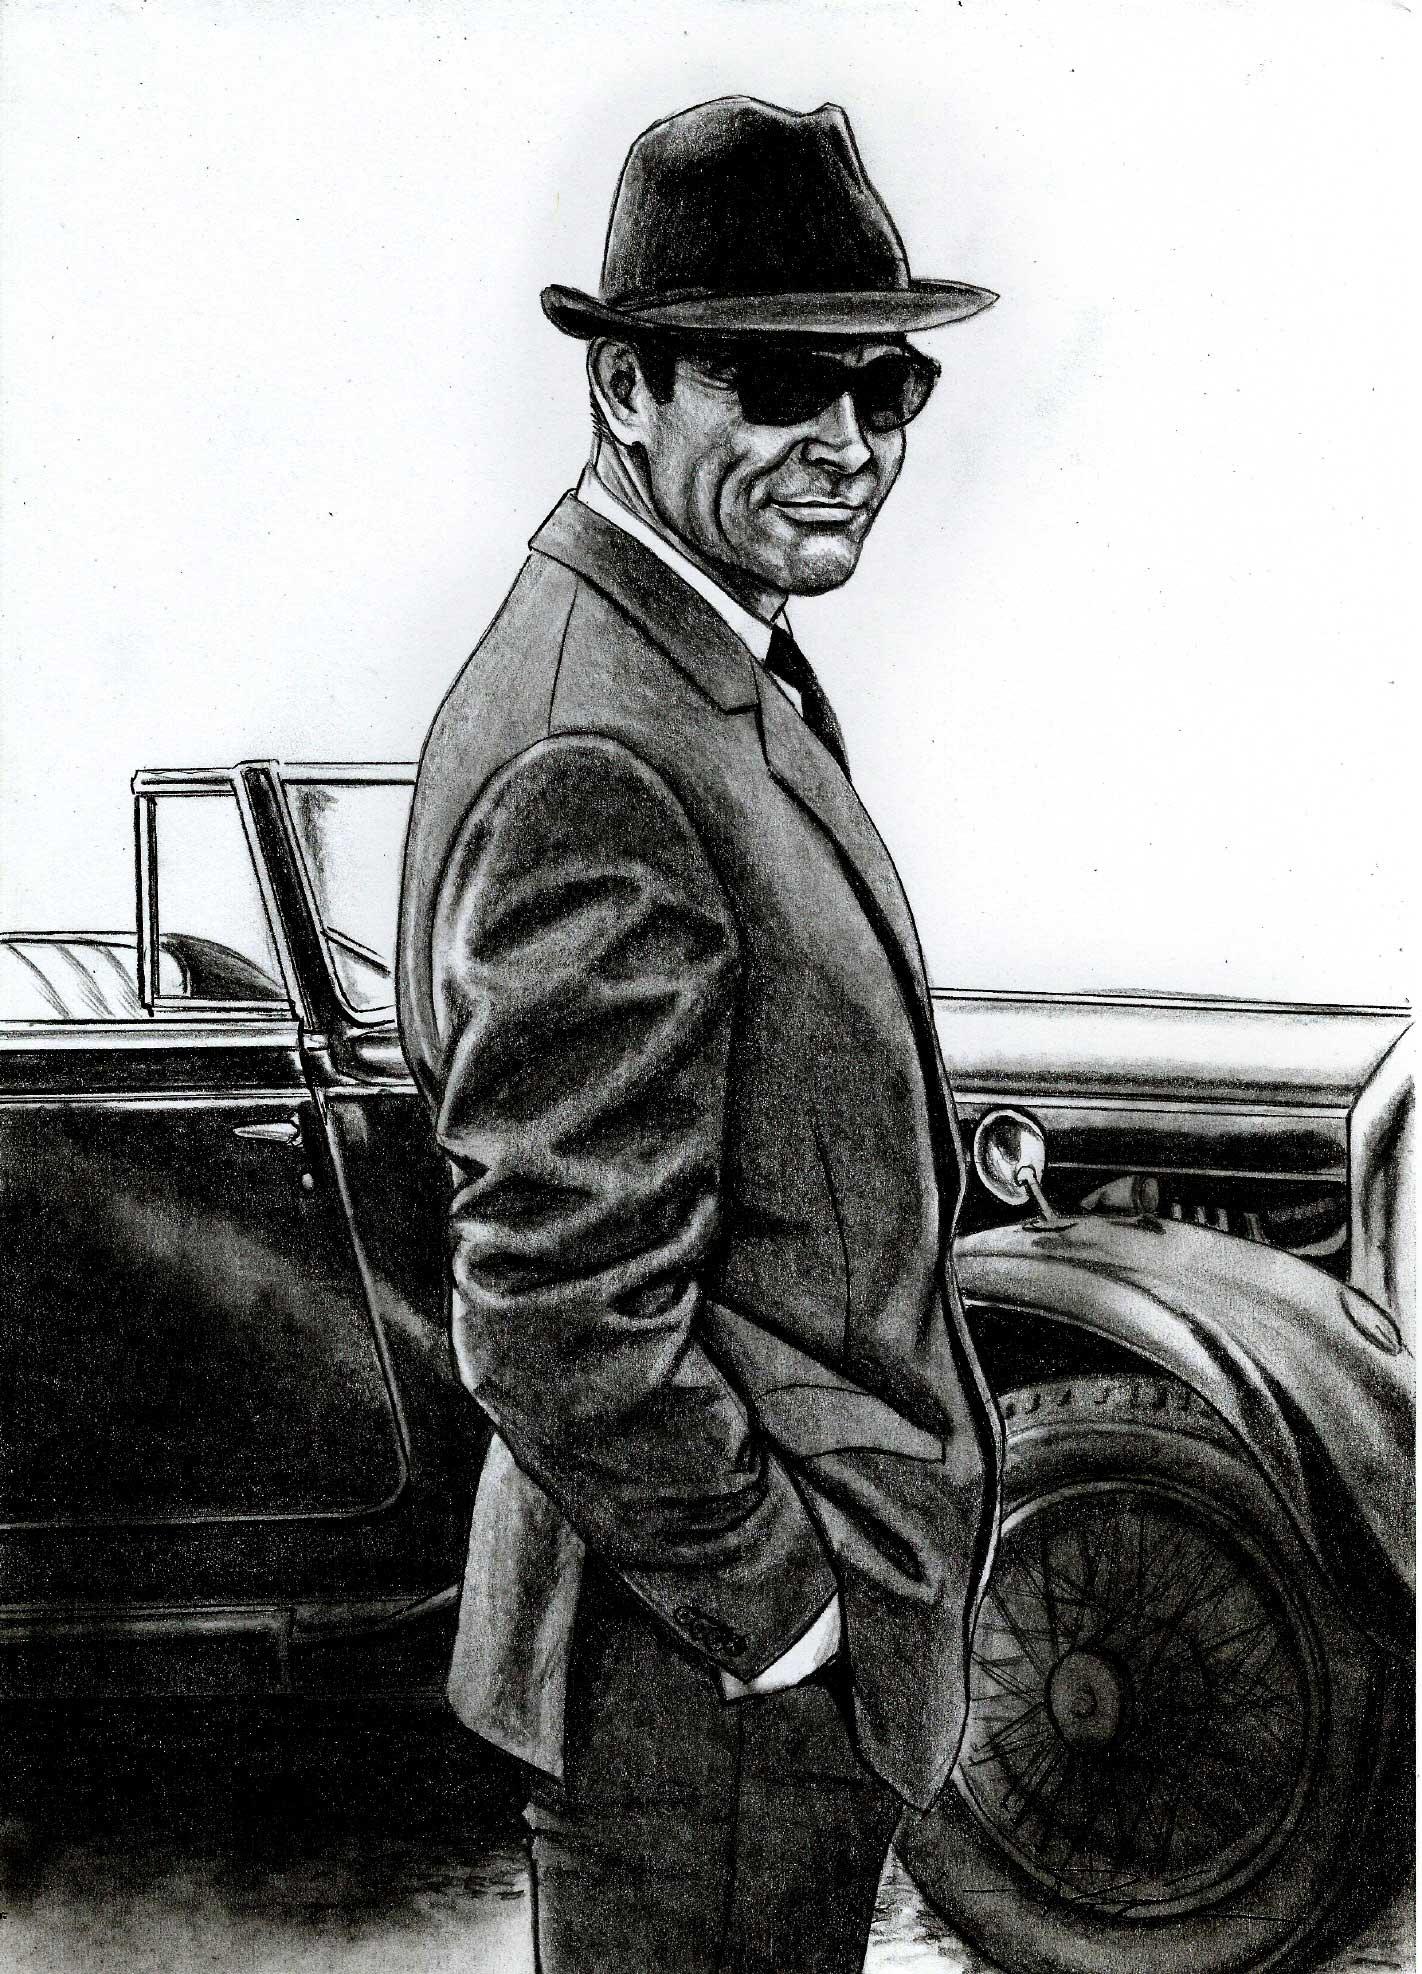 James Bond Dr No drawing